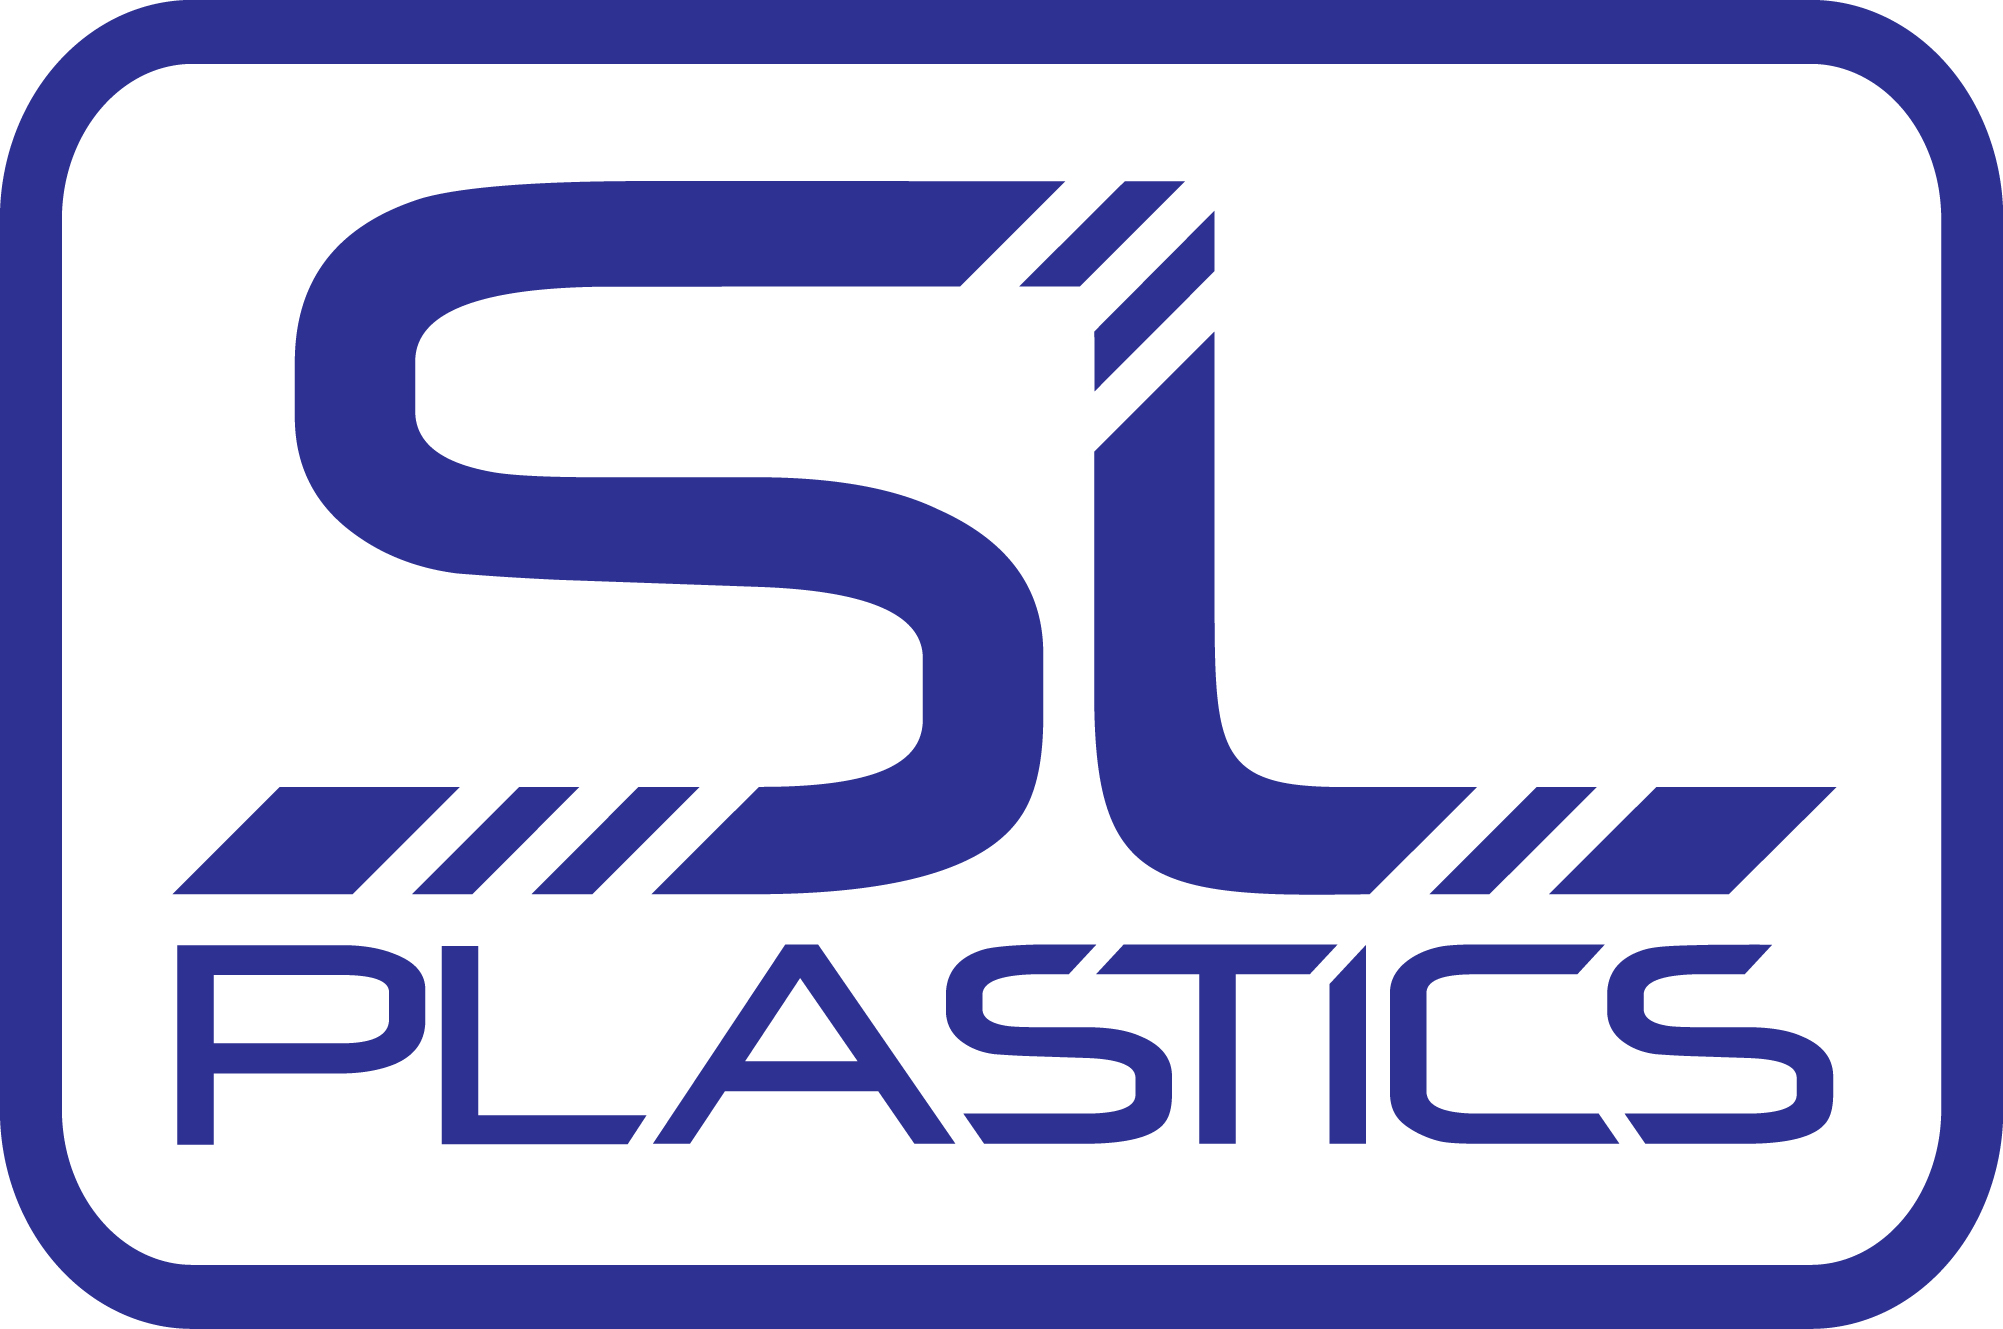 SL Plastics